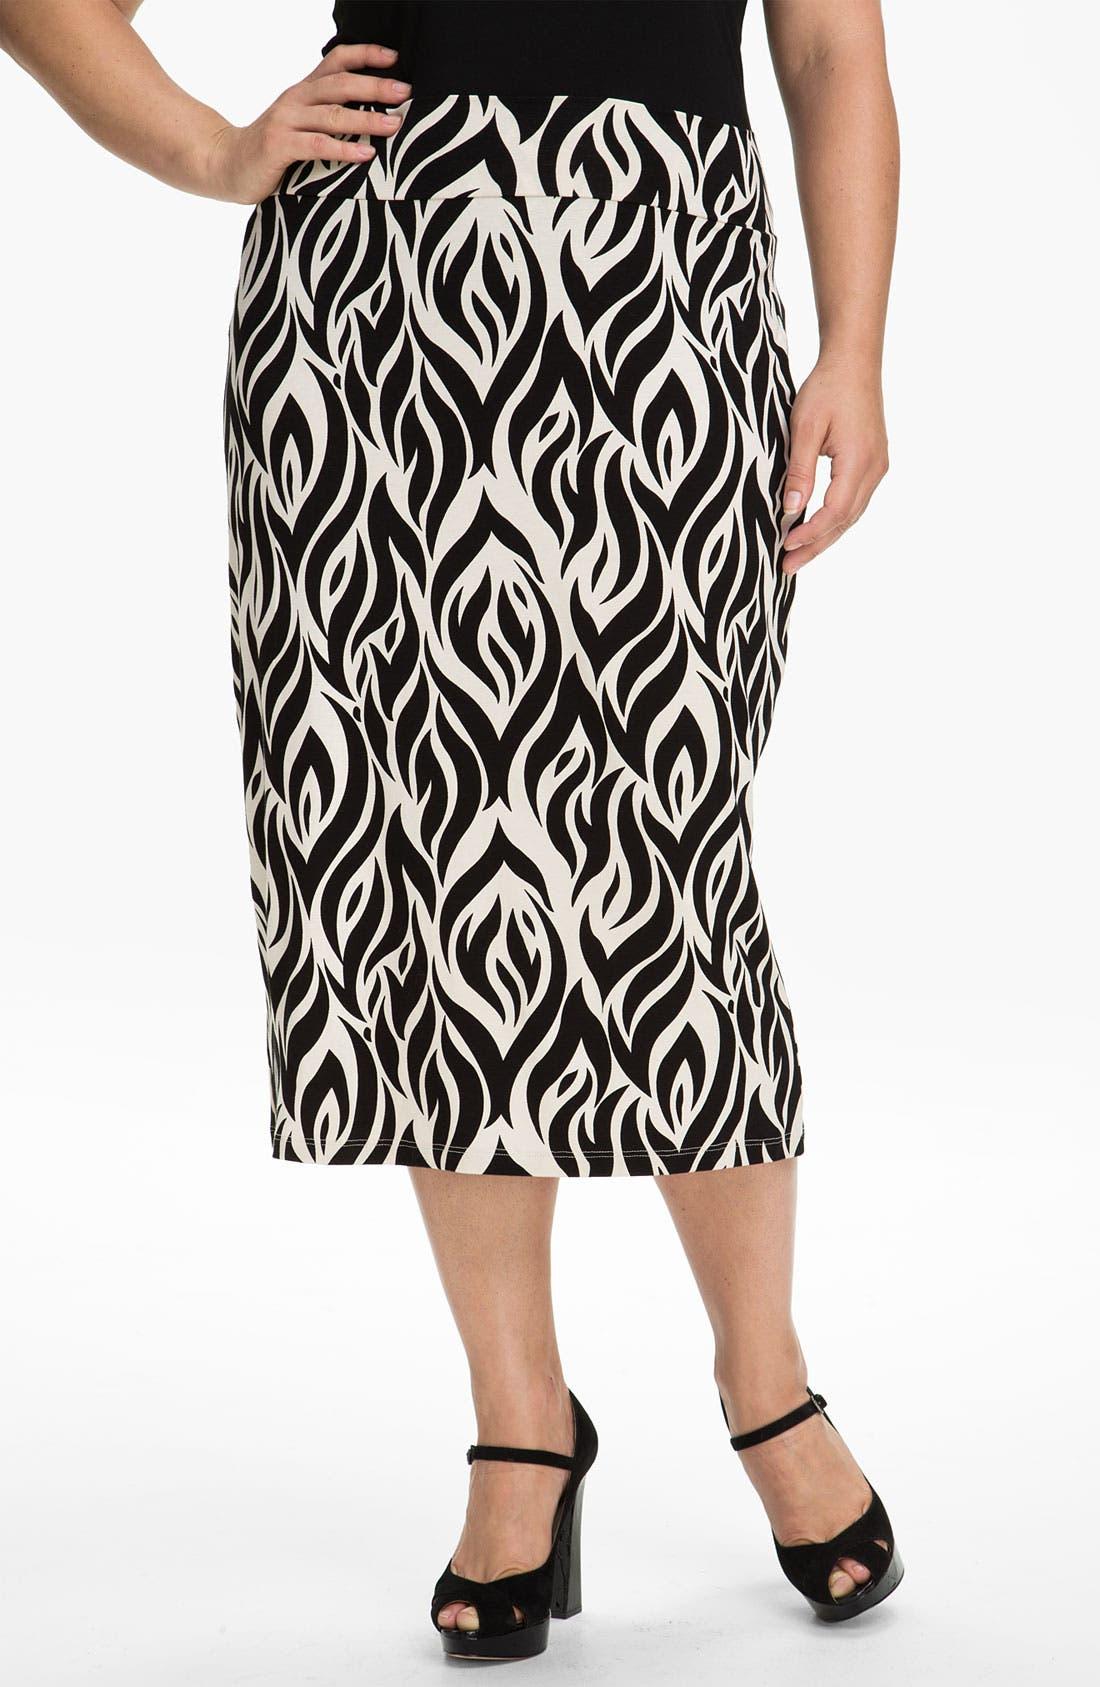 Alternate Image 1 Selected - Rachel Pally 'Bonnie' Print Knit Skirt (Plus)